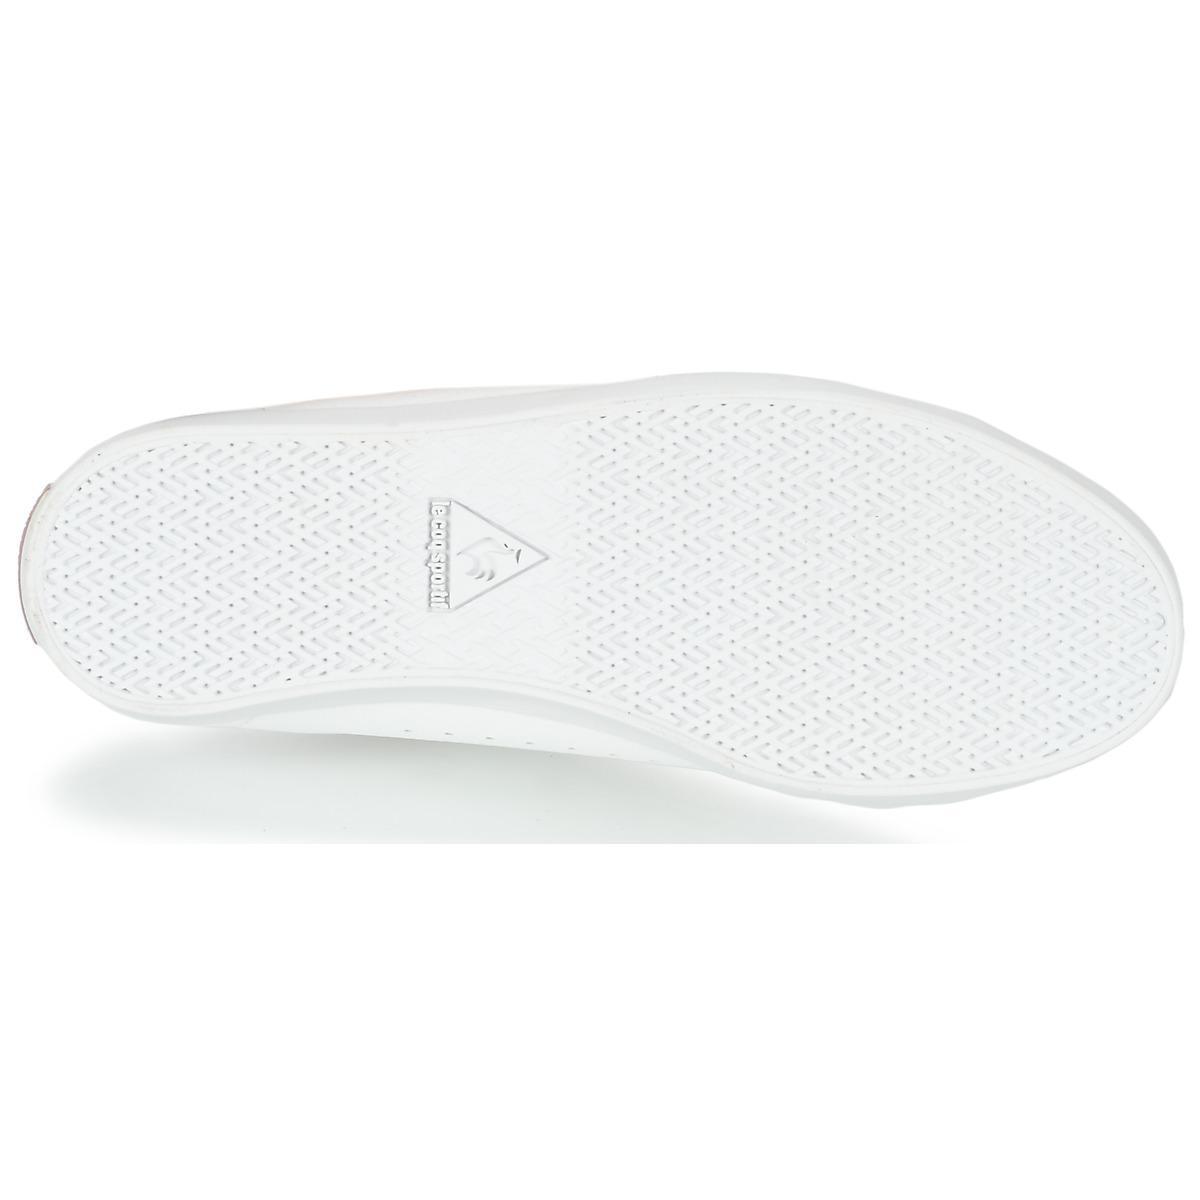 9ef364a5b6ad Le Coq Sportif Agate Lo S Lea metallic Women s Shoes (trainers) In ...